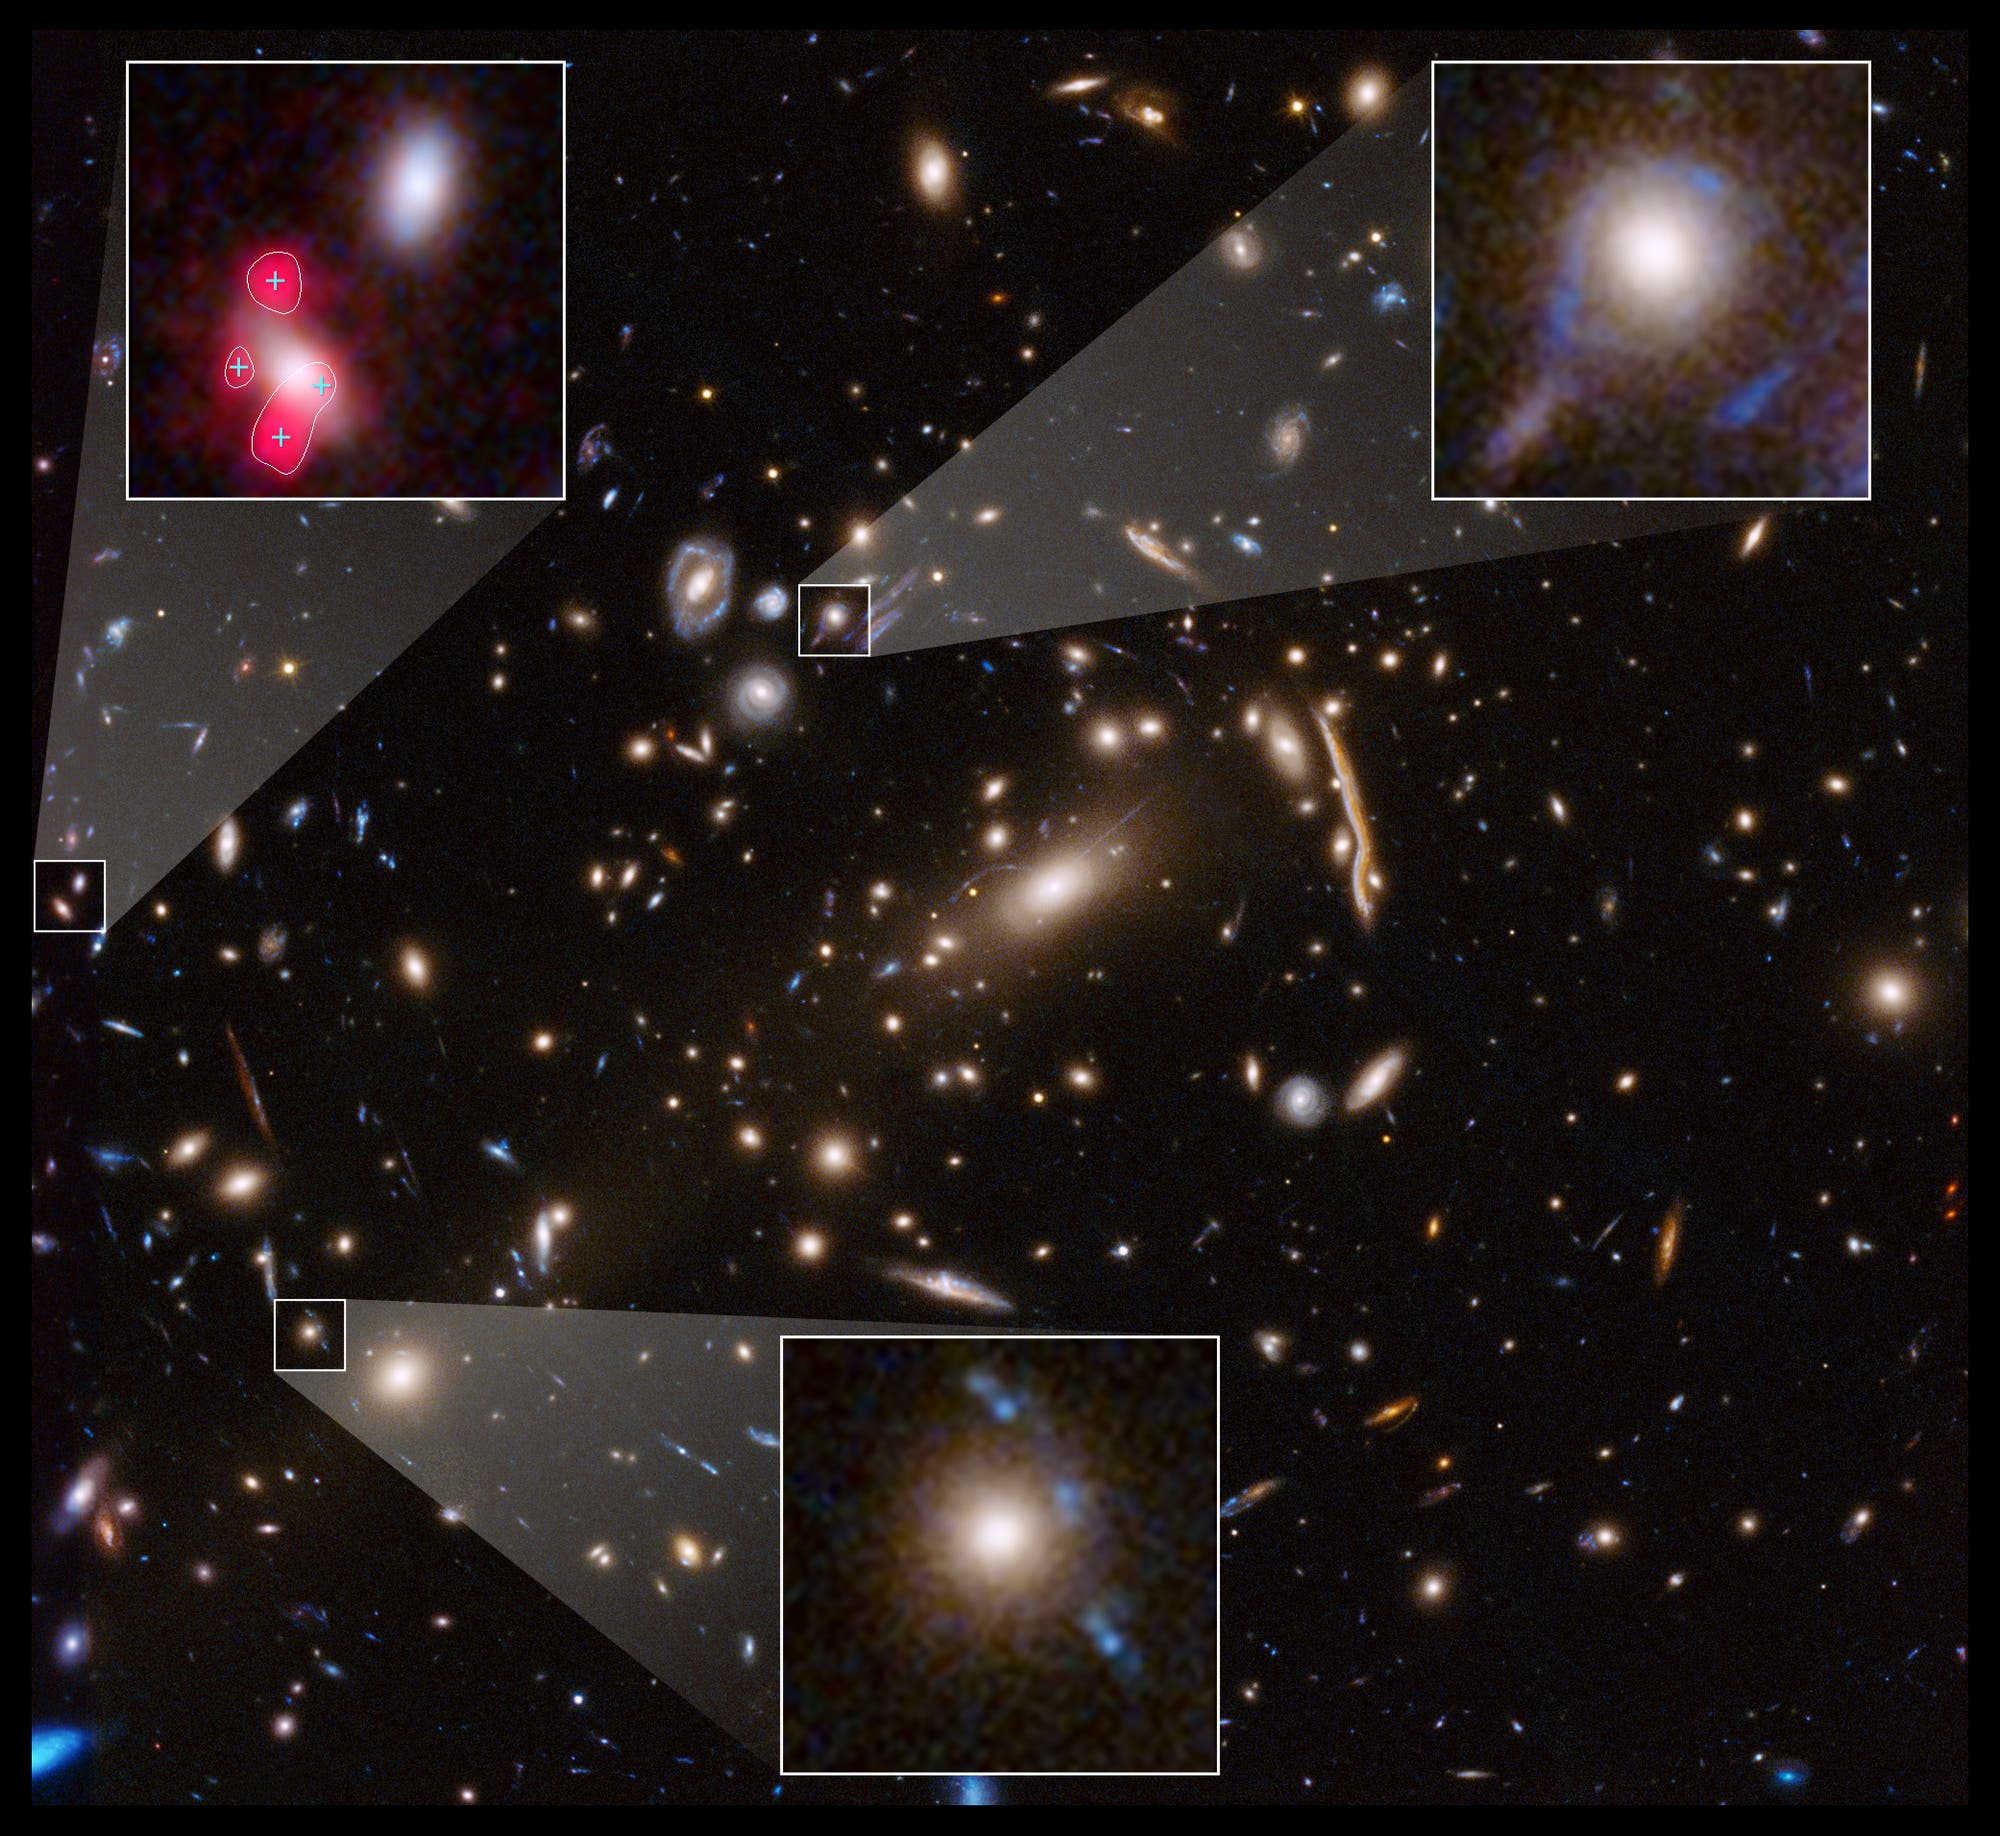 Galaxienhaufen MACSJ 1206